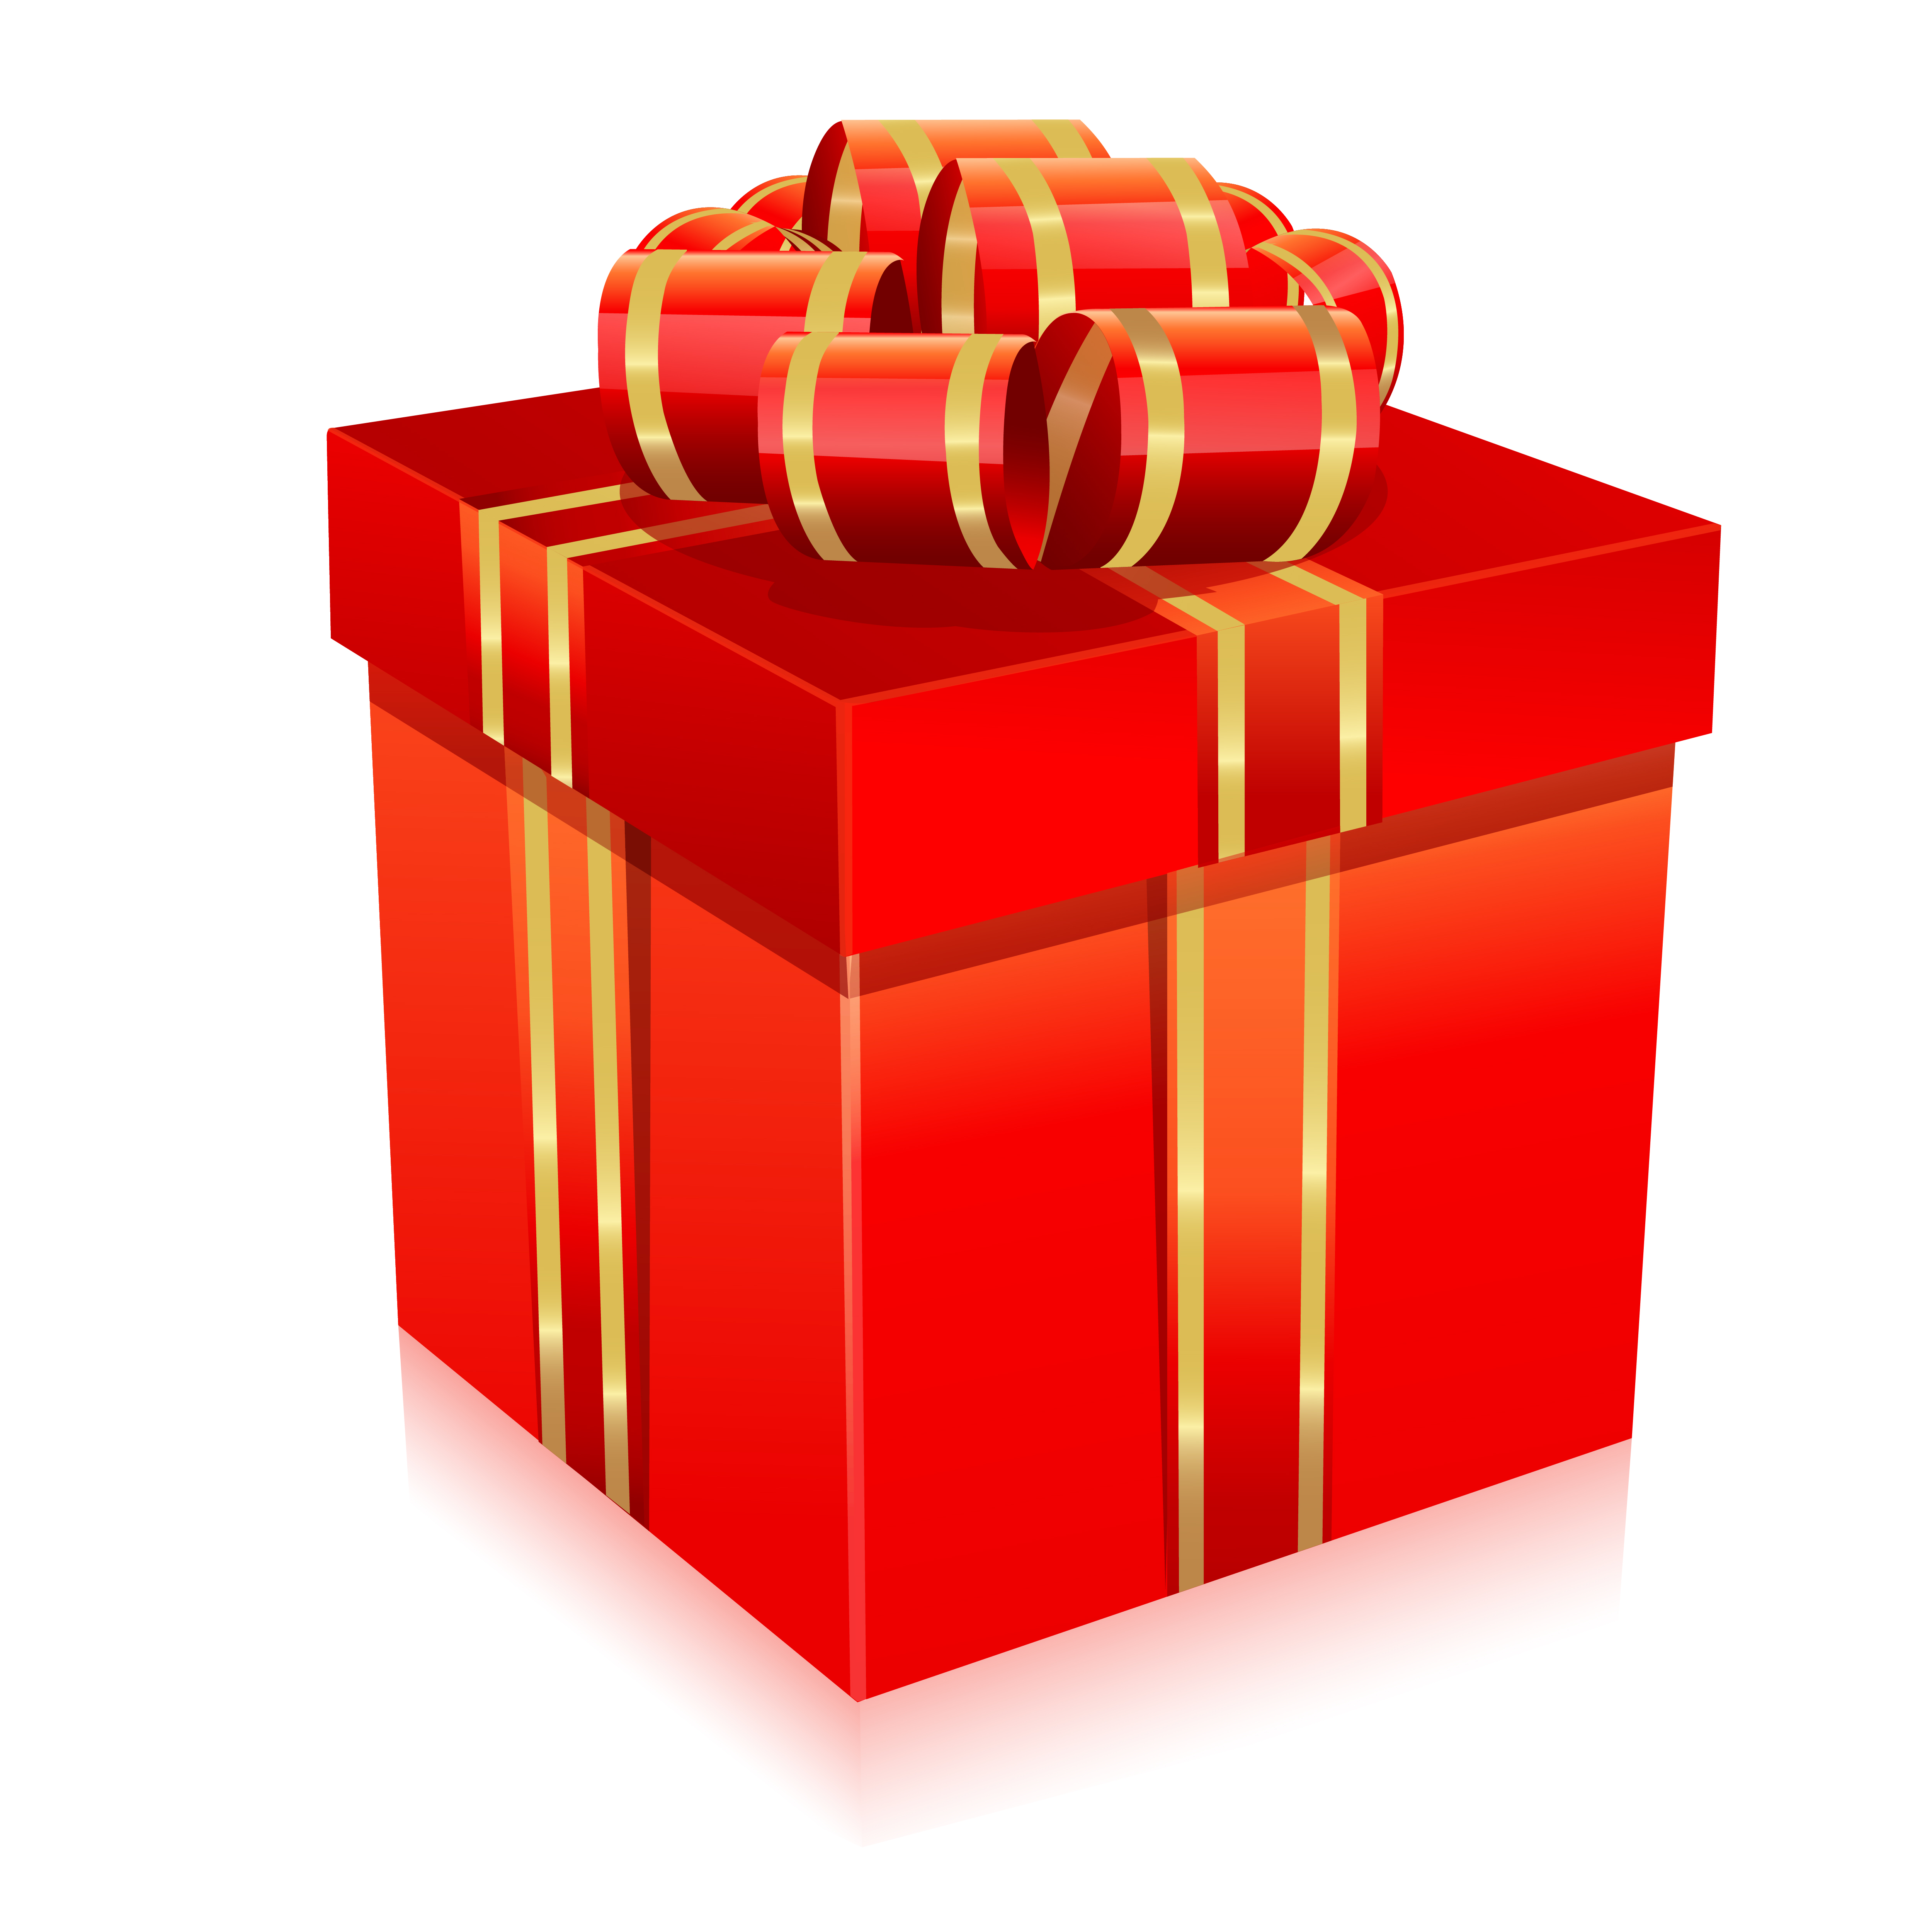 Gift Box - Download Free Vectors, Clipart Graphics ...